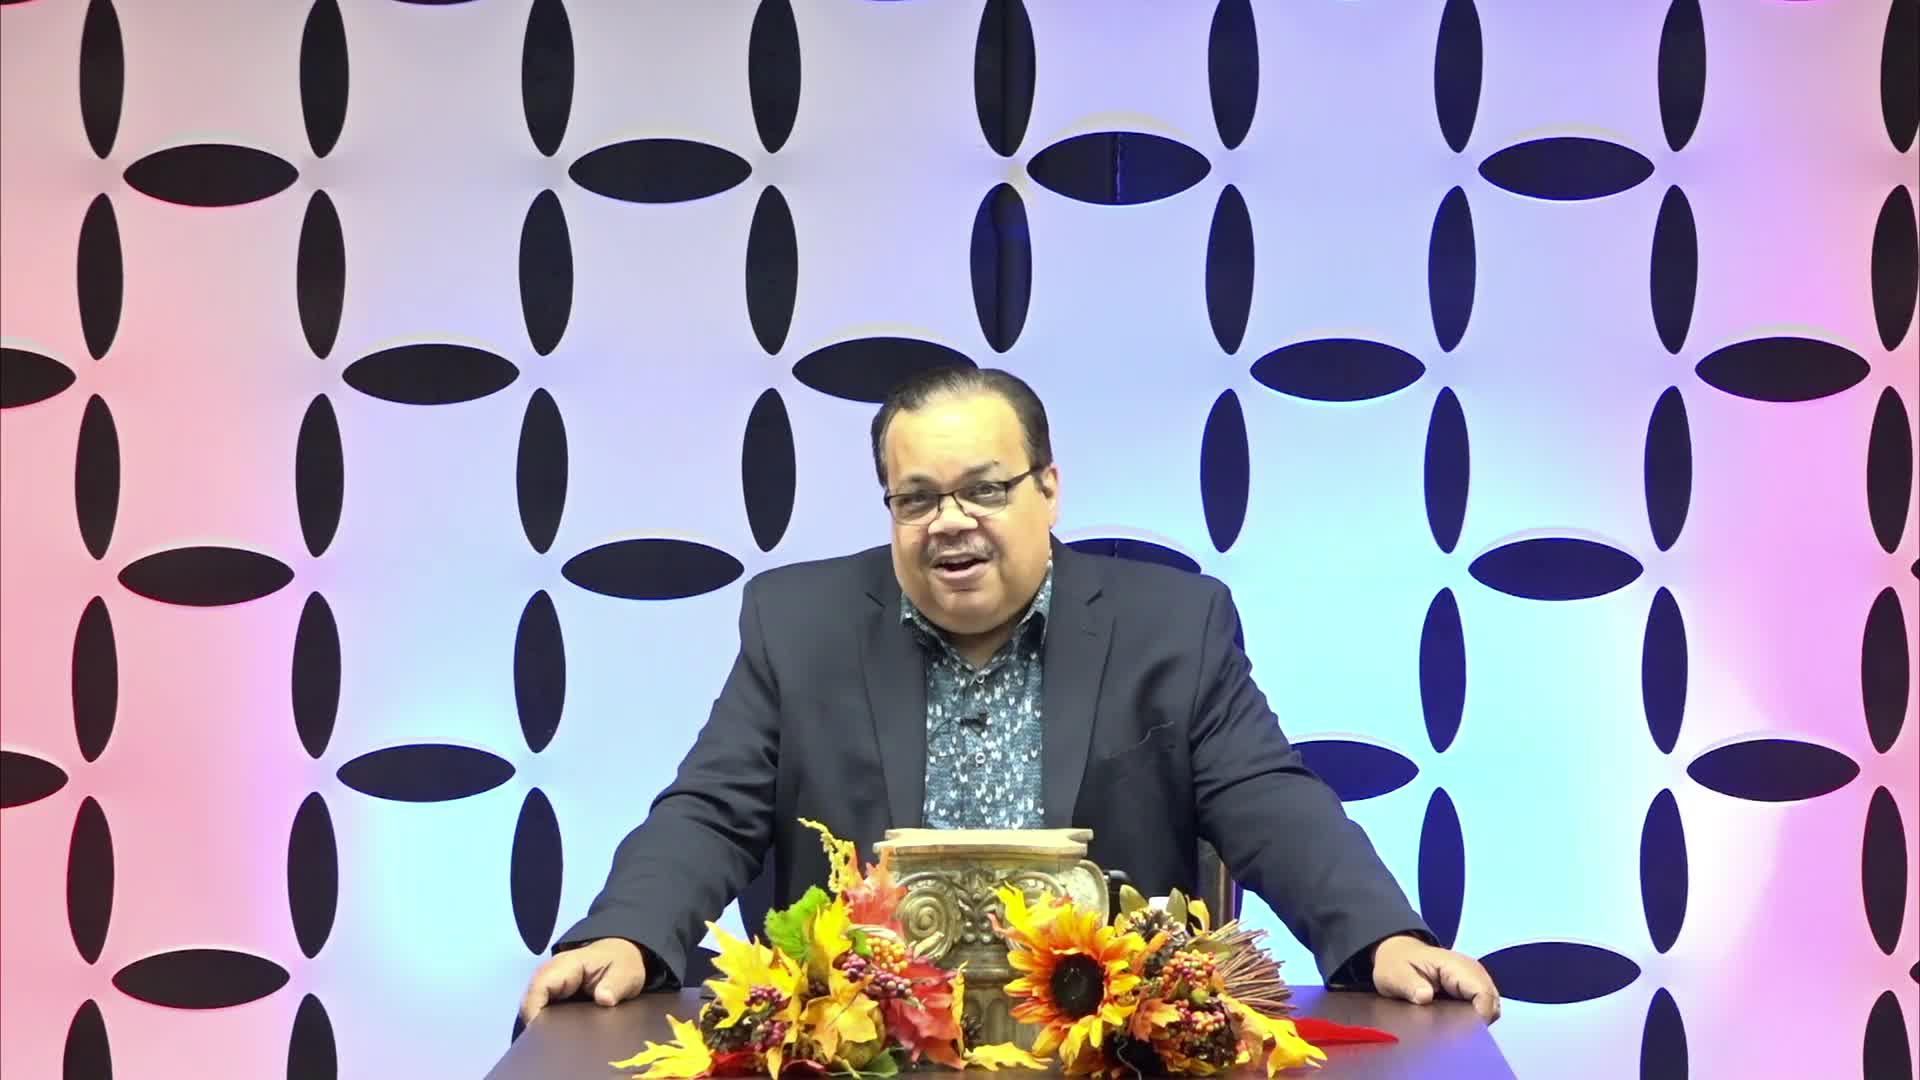 Understanding The Leading of The Holy Spirit- Dr. Joseph Ripley, Sr. -sun. Oct. 3rd, 2021@7:00PM